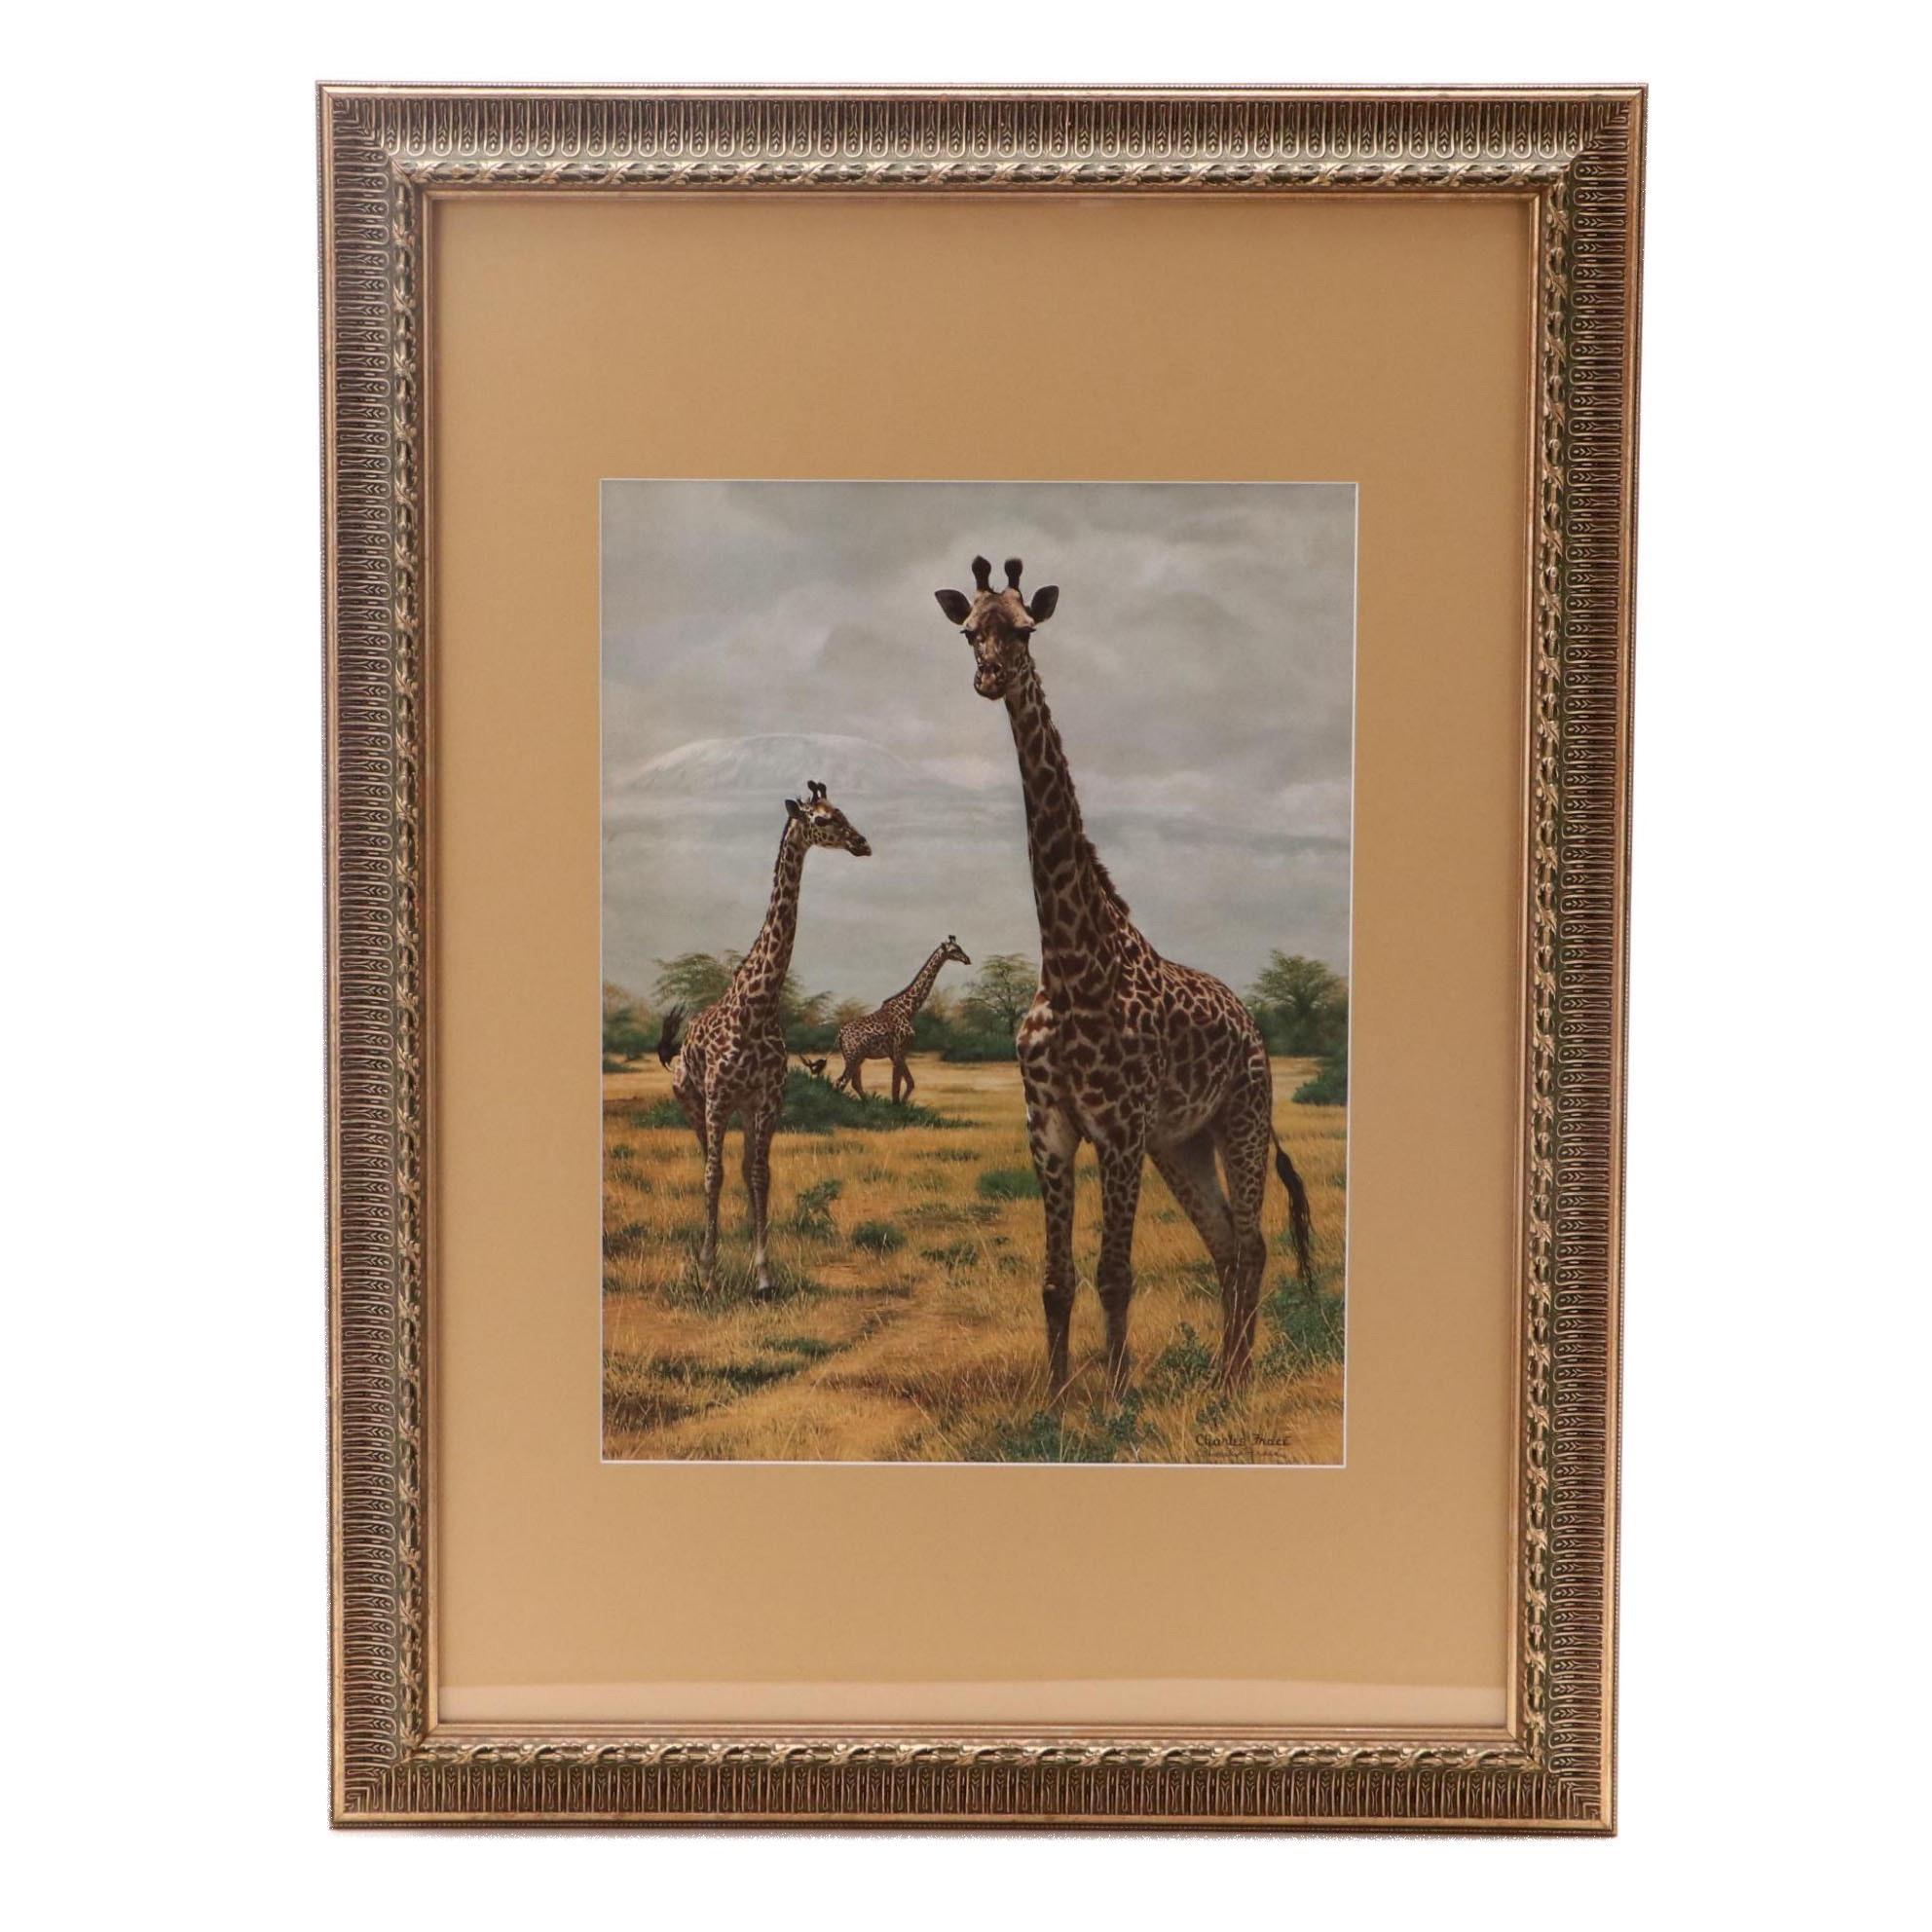 Charles Fracé Offset Lithograph of Giraffes